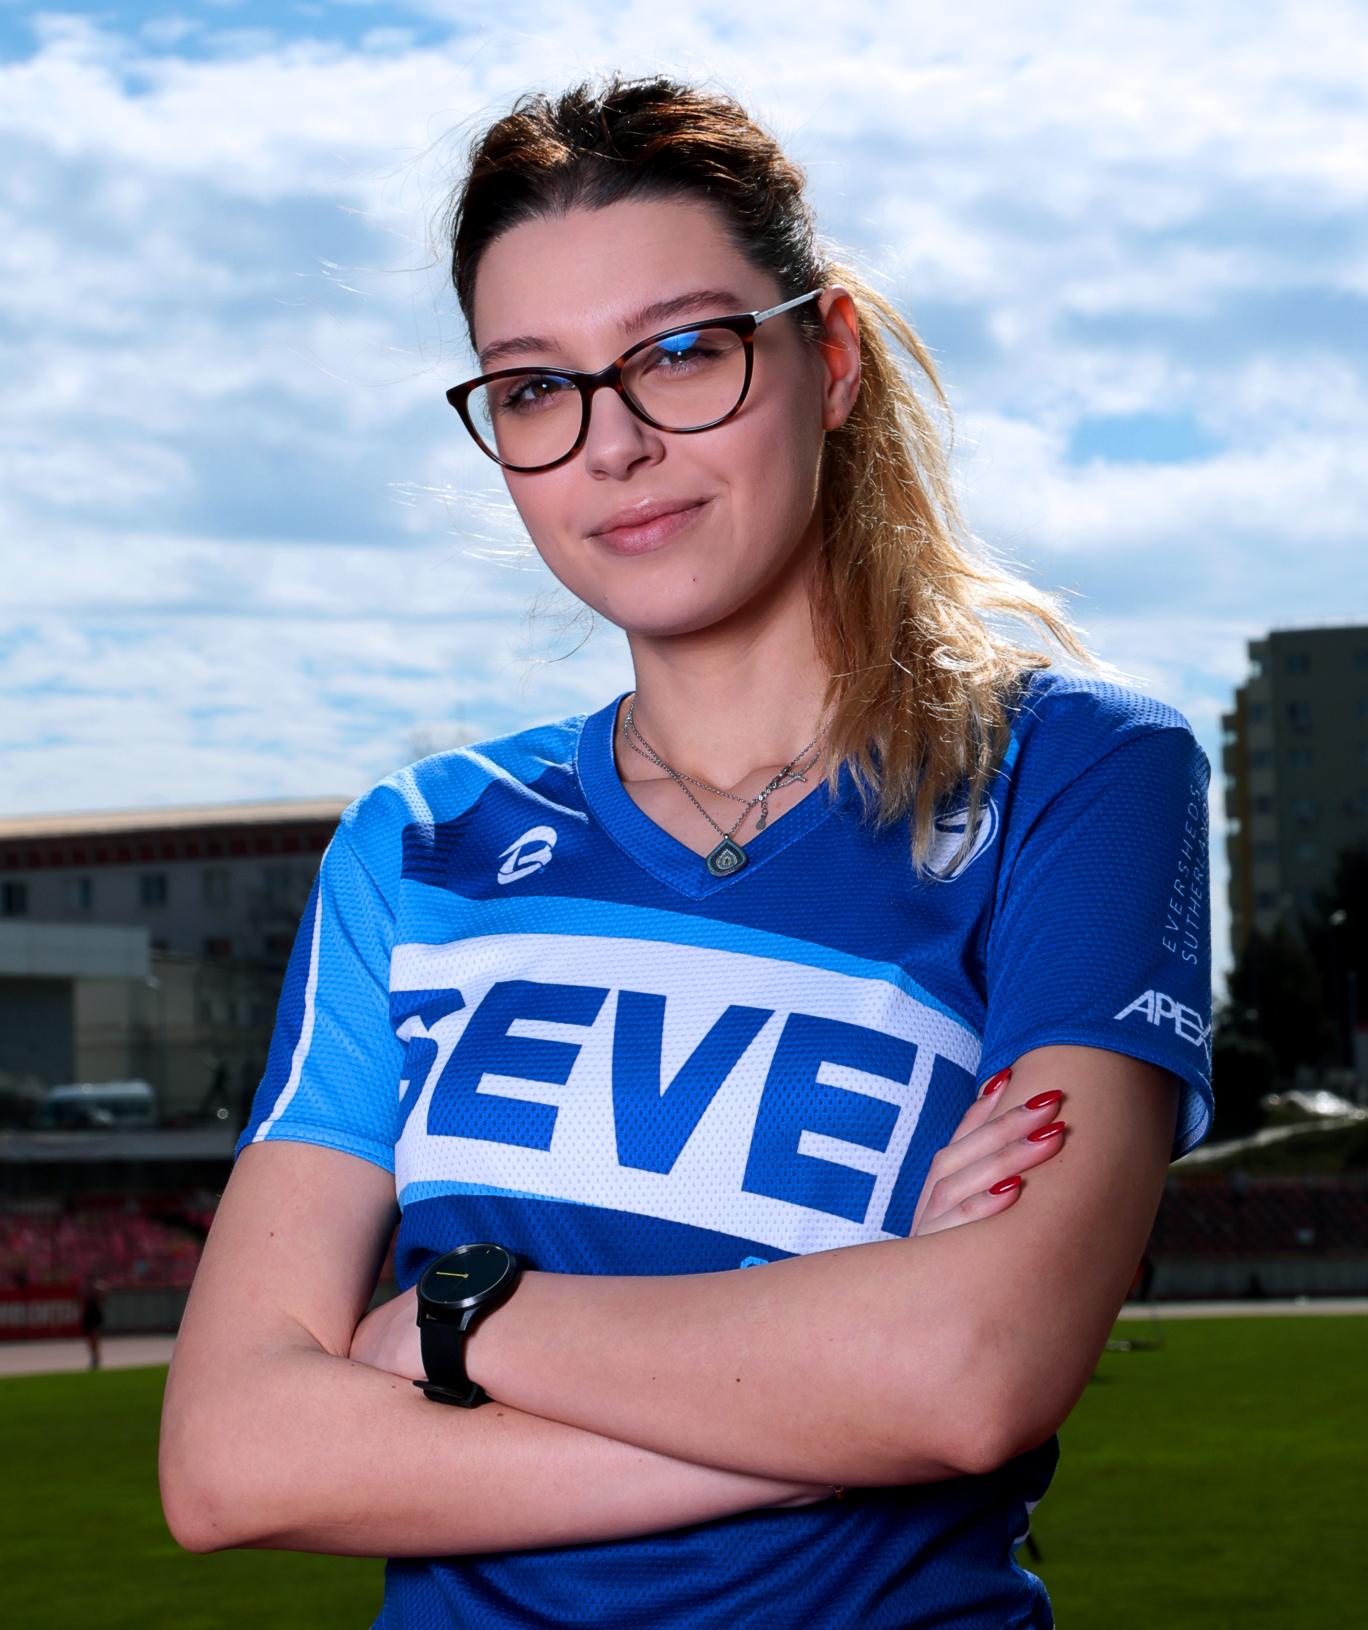 https://www.sevensportclub.ro/wp-content/uploads/2020/11/Antrenori_684x815_Adina.jpg